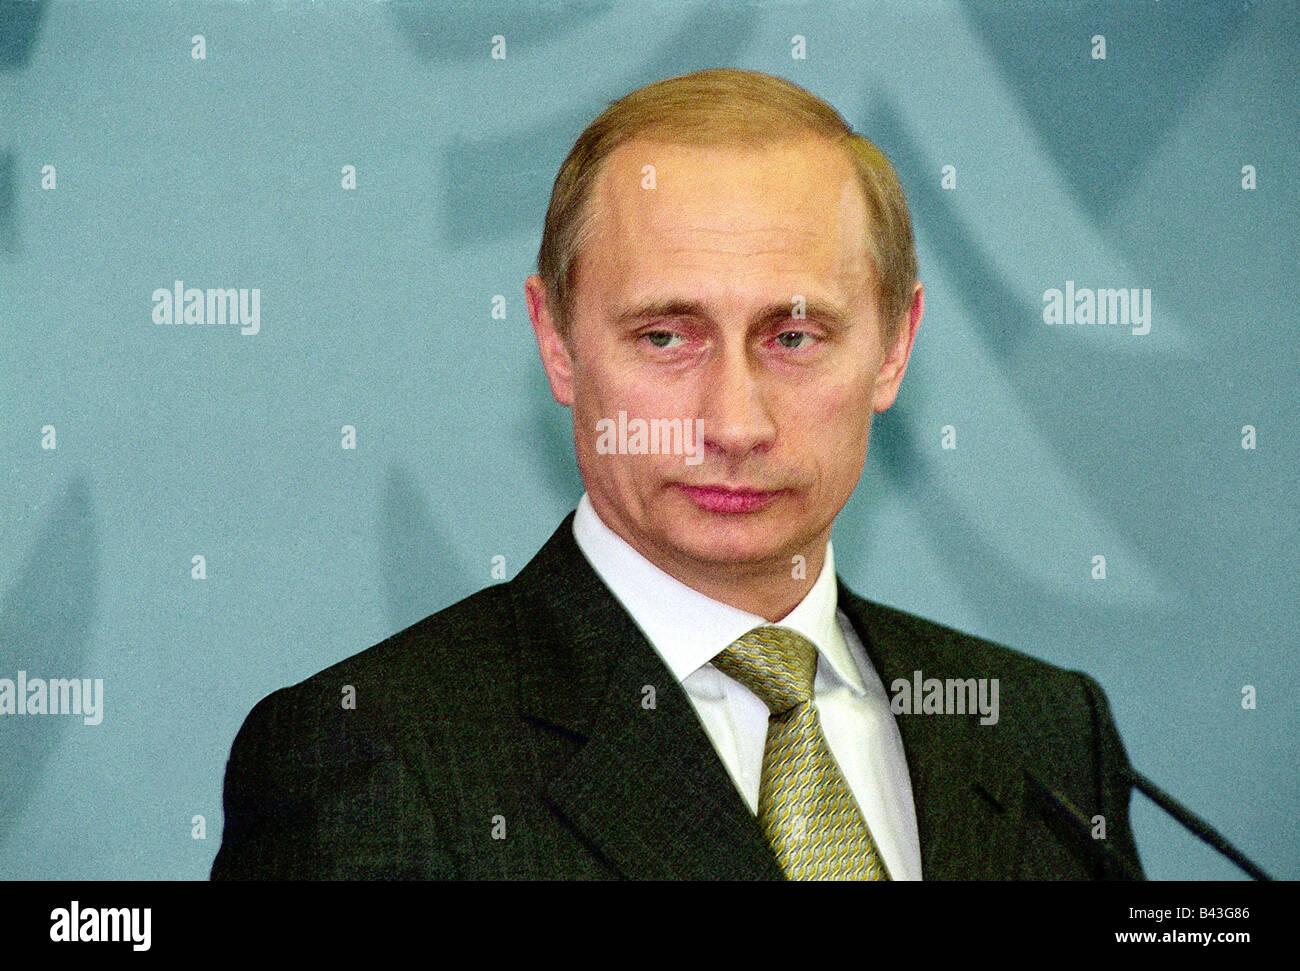 Putin, Vladimir, * 7.10.1952, Russian politician, president of Russia since 2000, portrait, visiting Berlin, 15.6.2000, - Stock Image